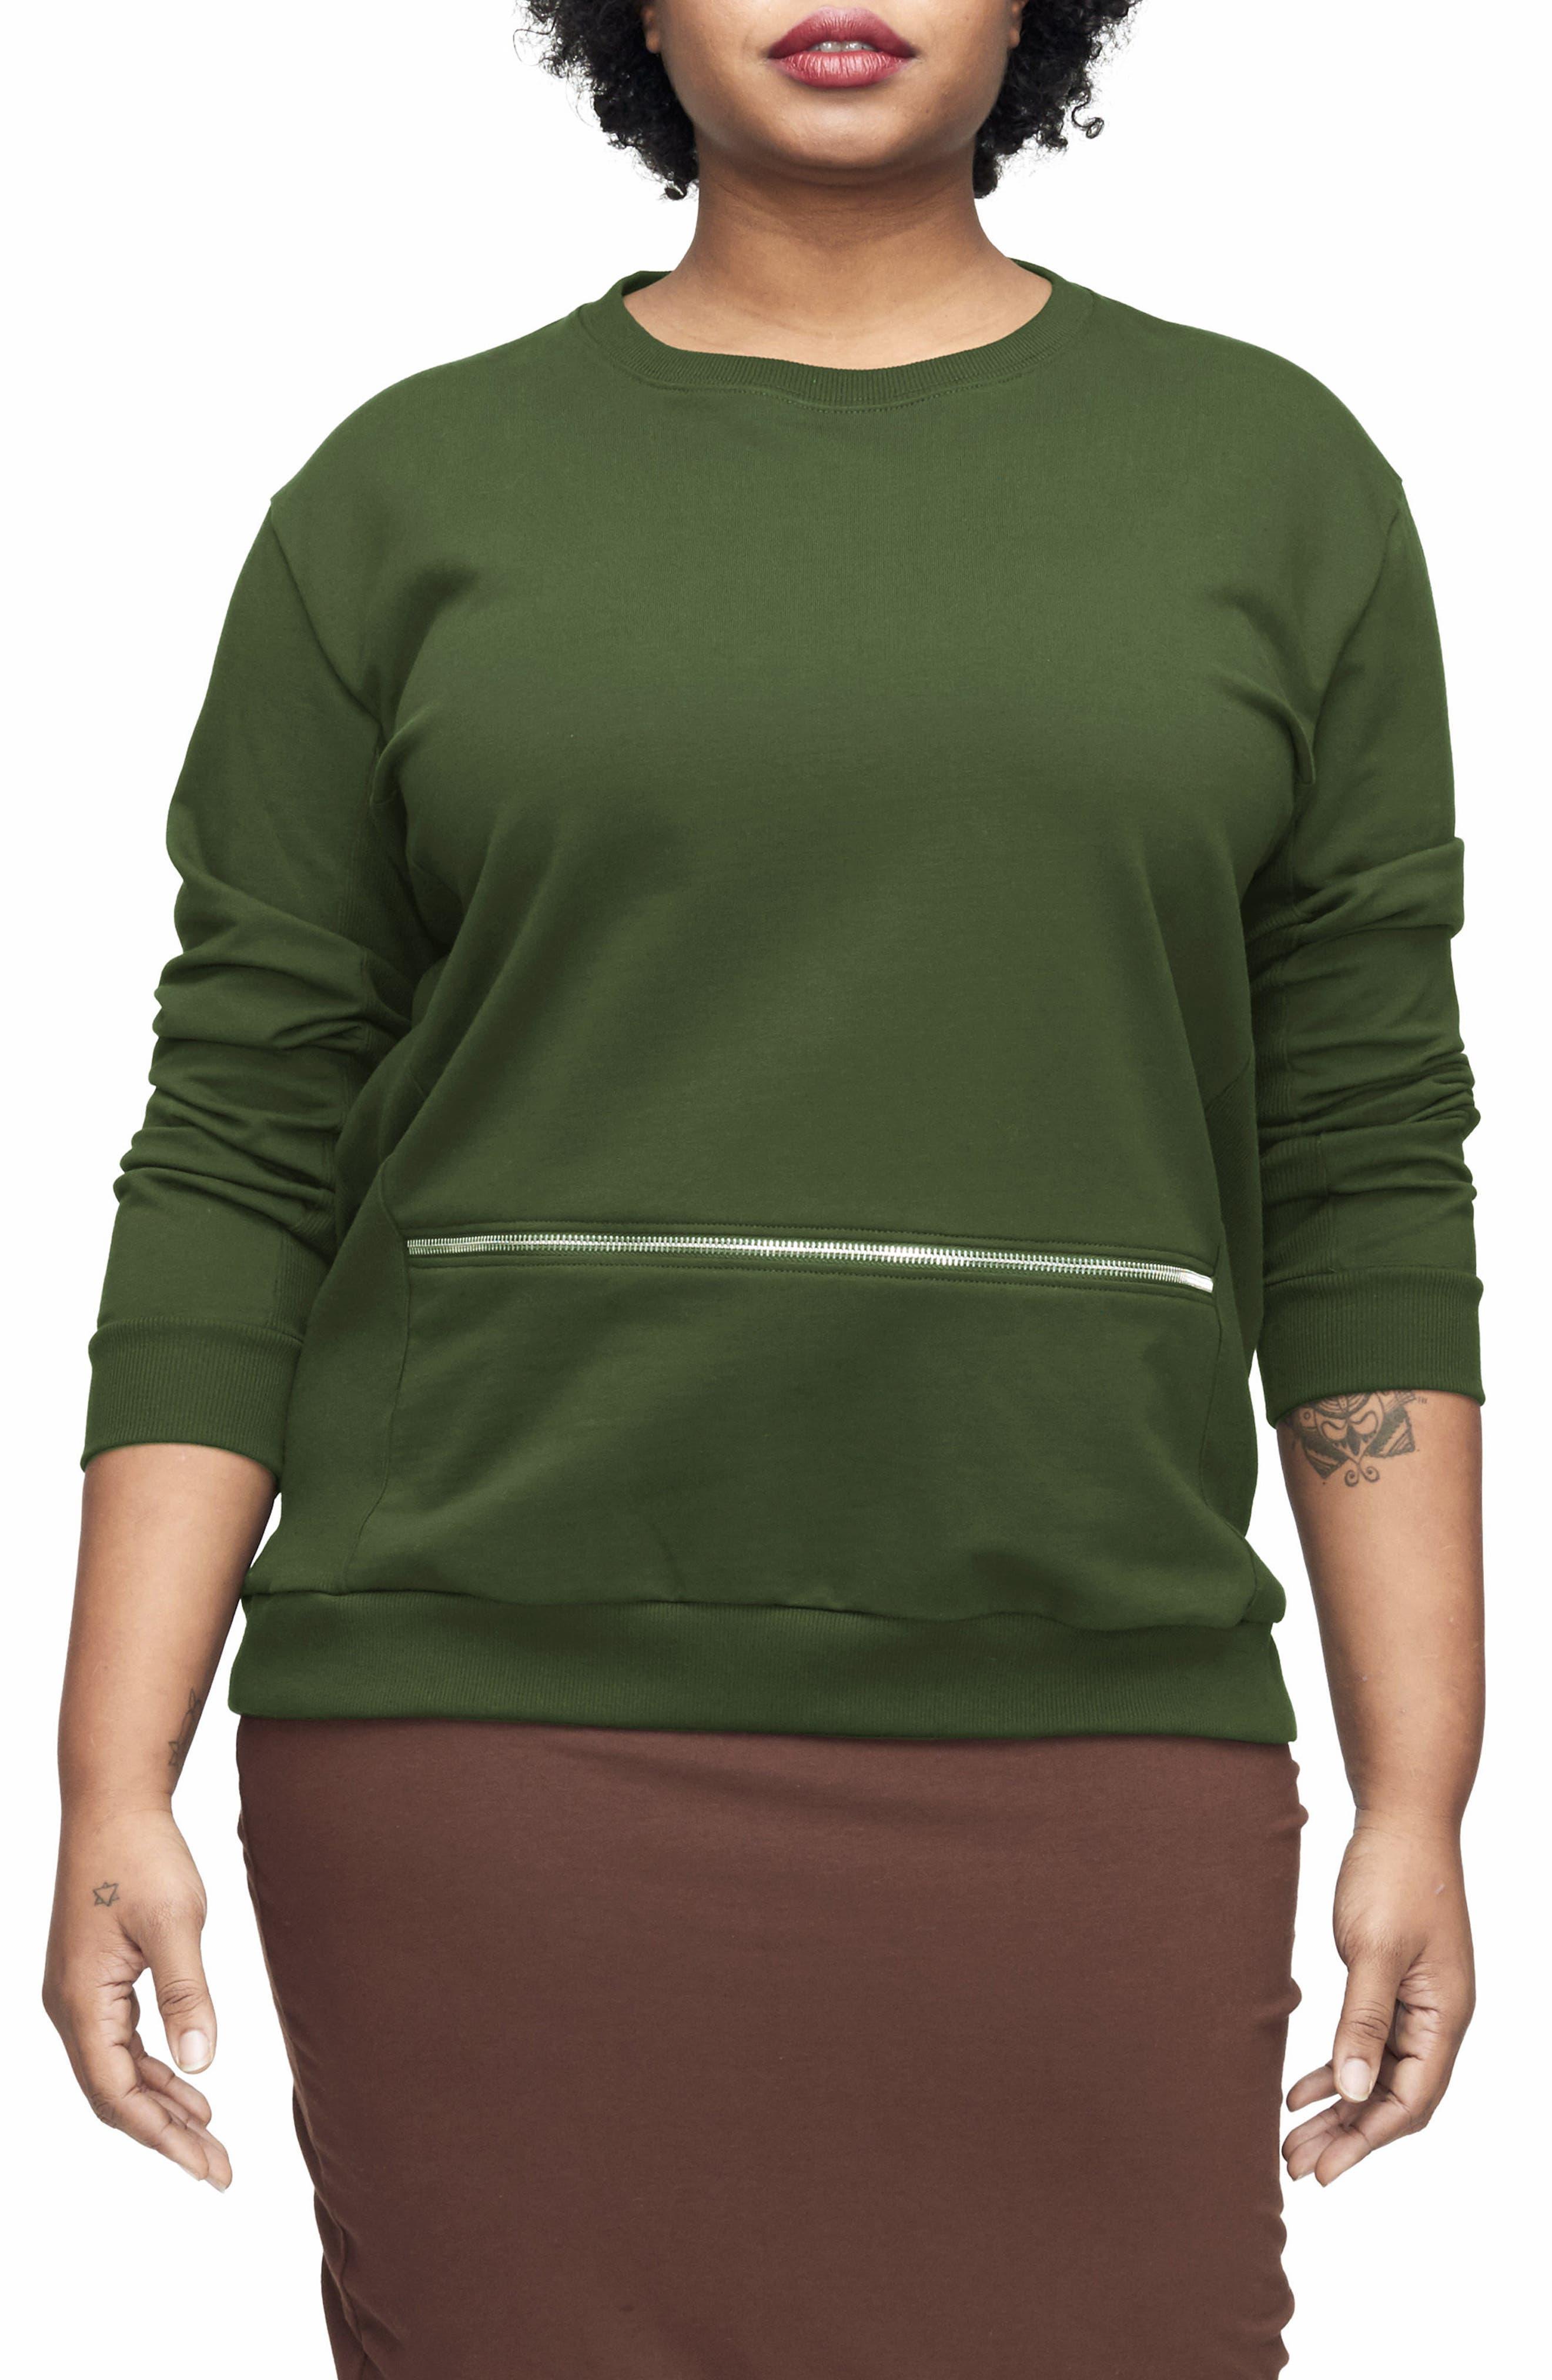 Alternate Image 1 Selected - UNIVERSAL STANDARD Equator Zip Trim Sweatshirt (Plus Size)